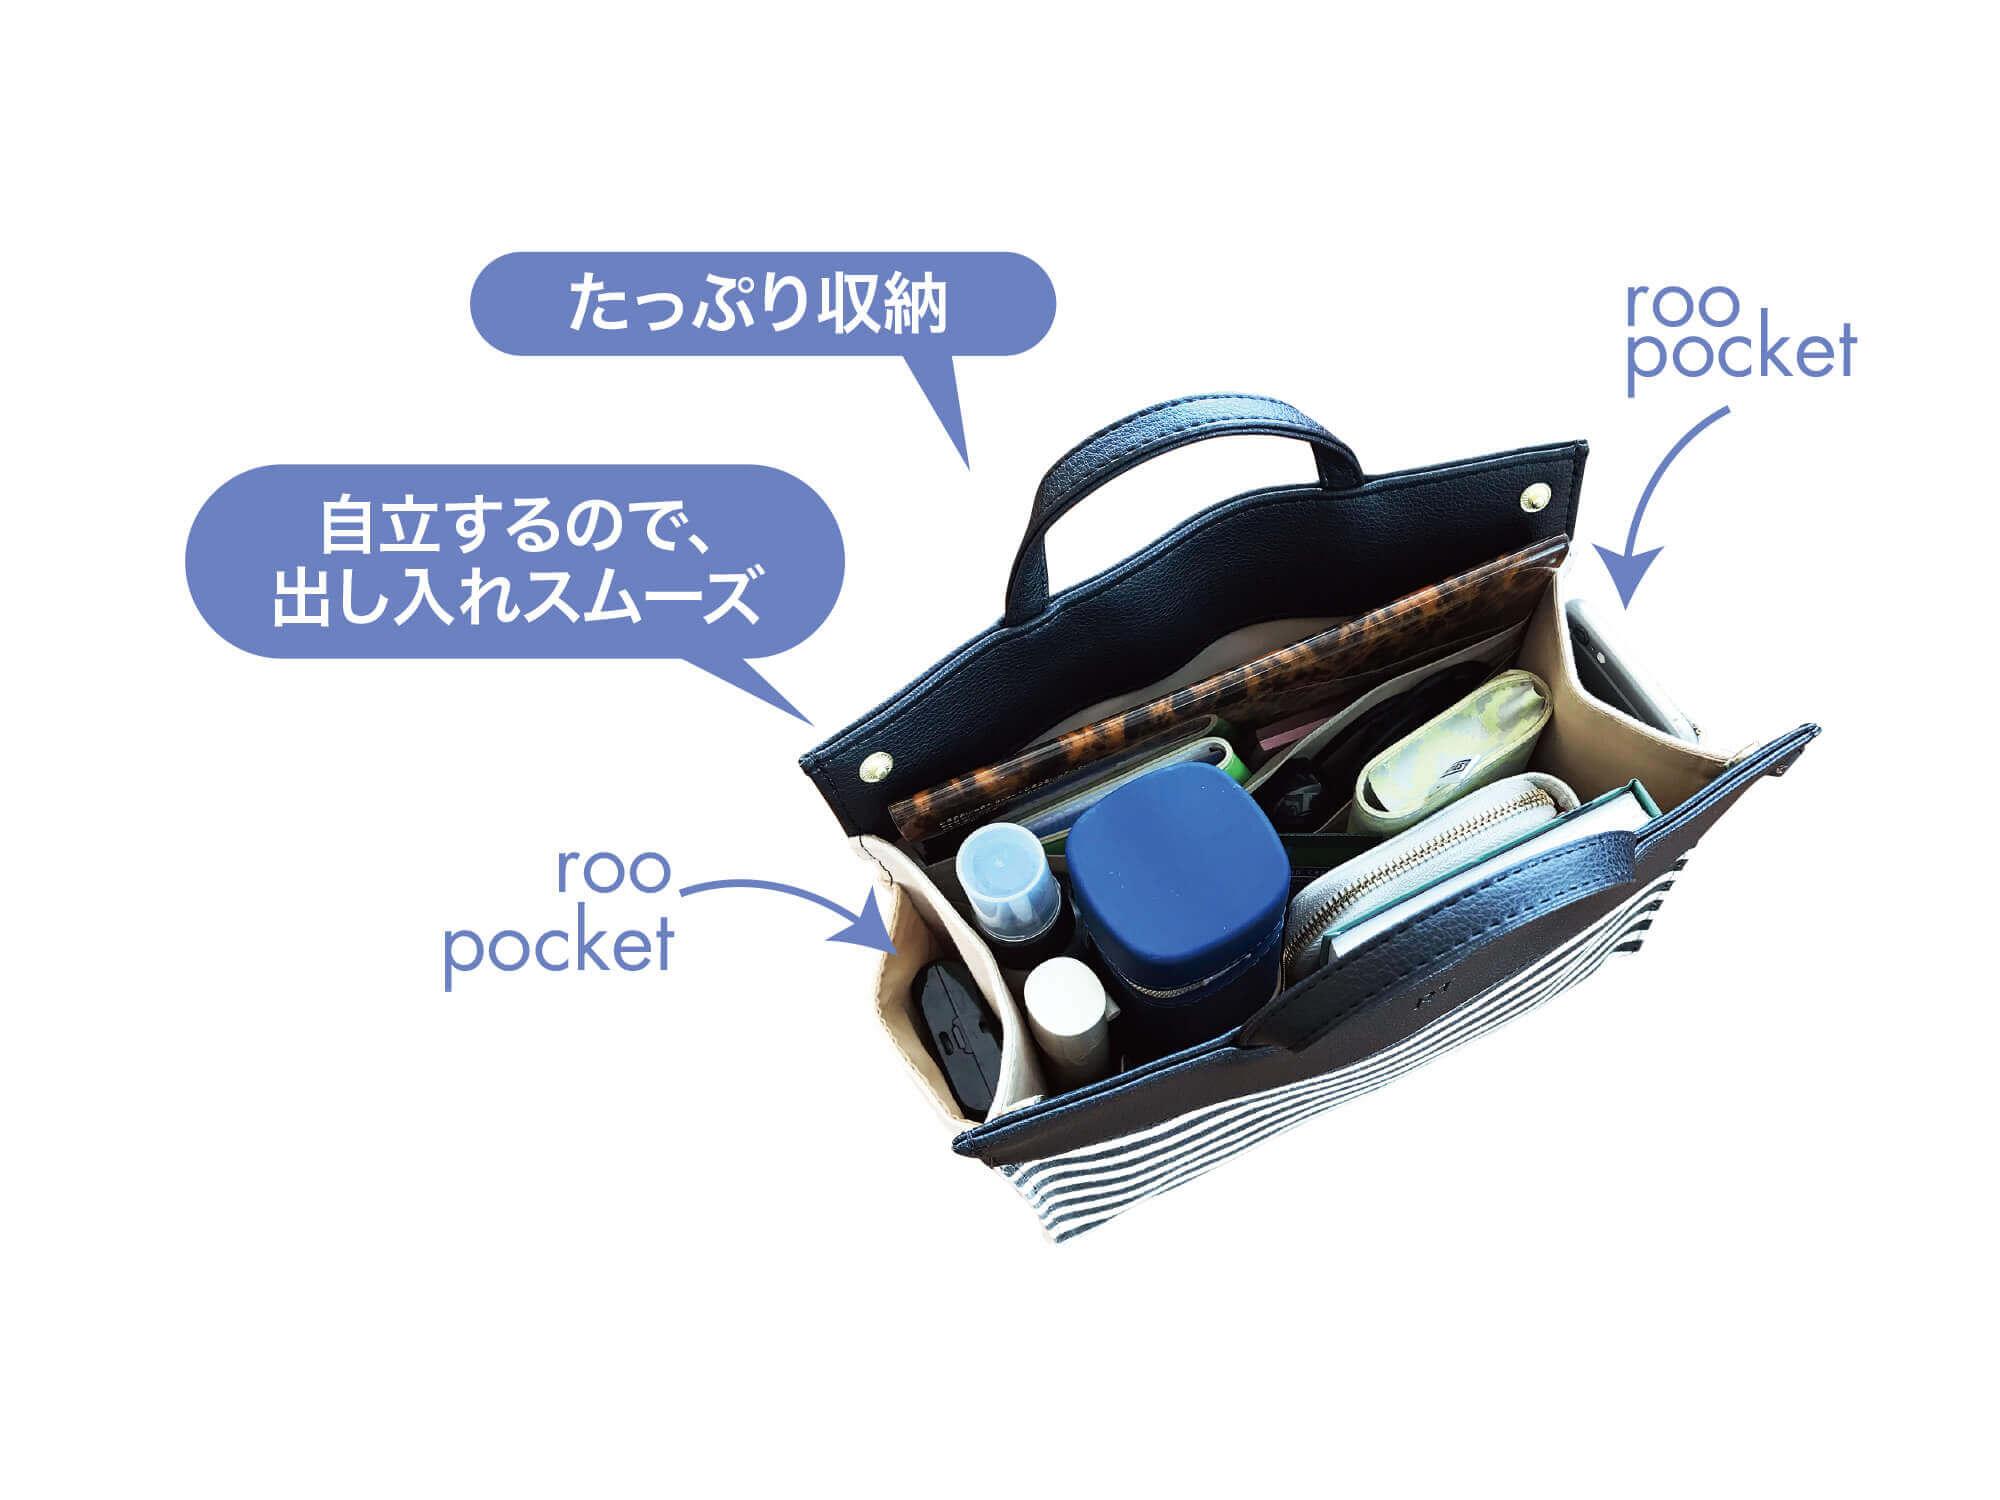 A5ノートやペンケース、お財布はもちろん、スマートフォン、充電器、ポケットWi-Fiなどたっぷり収納